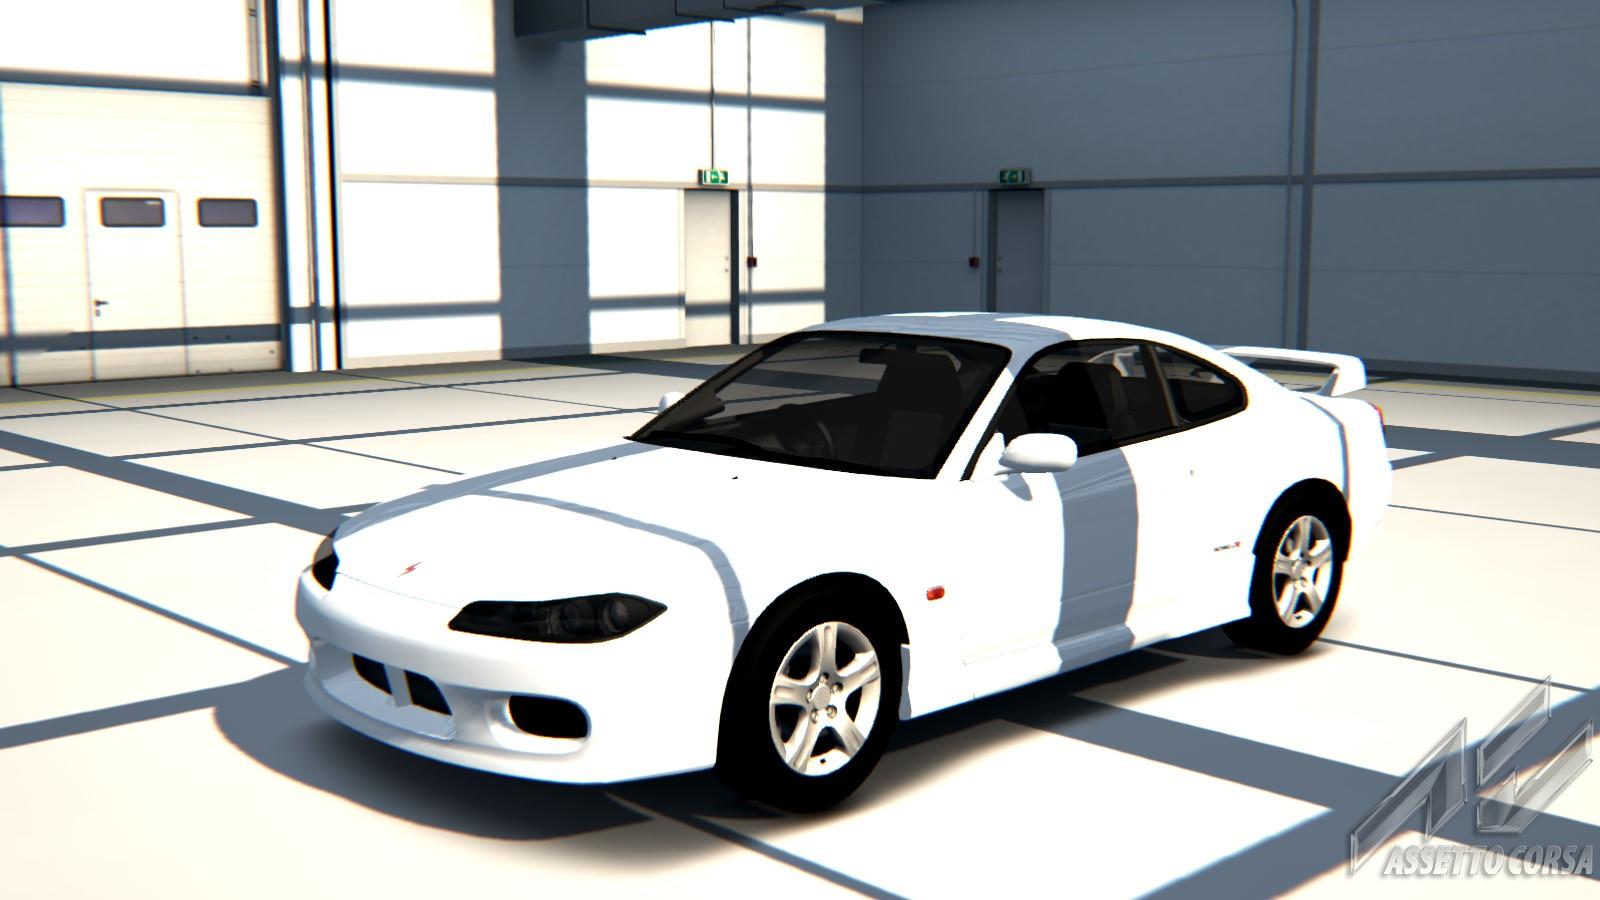 Nissan S15 Vh45 Car Detail Assetto Corsa Database Silvia Mona Lisa White